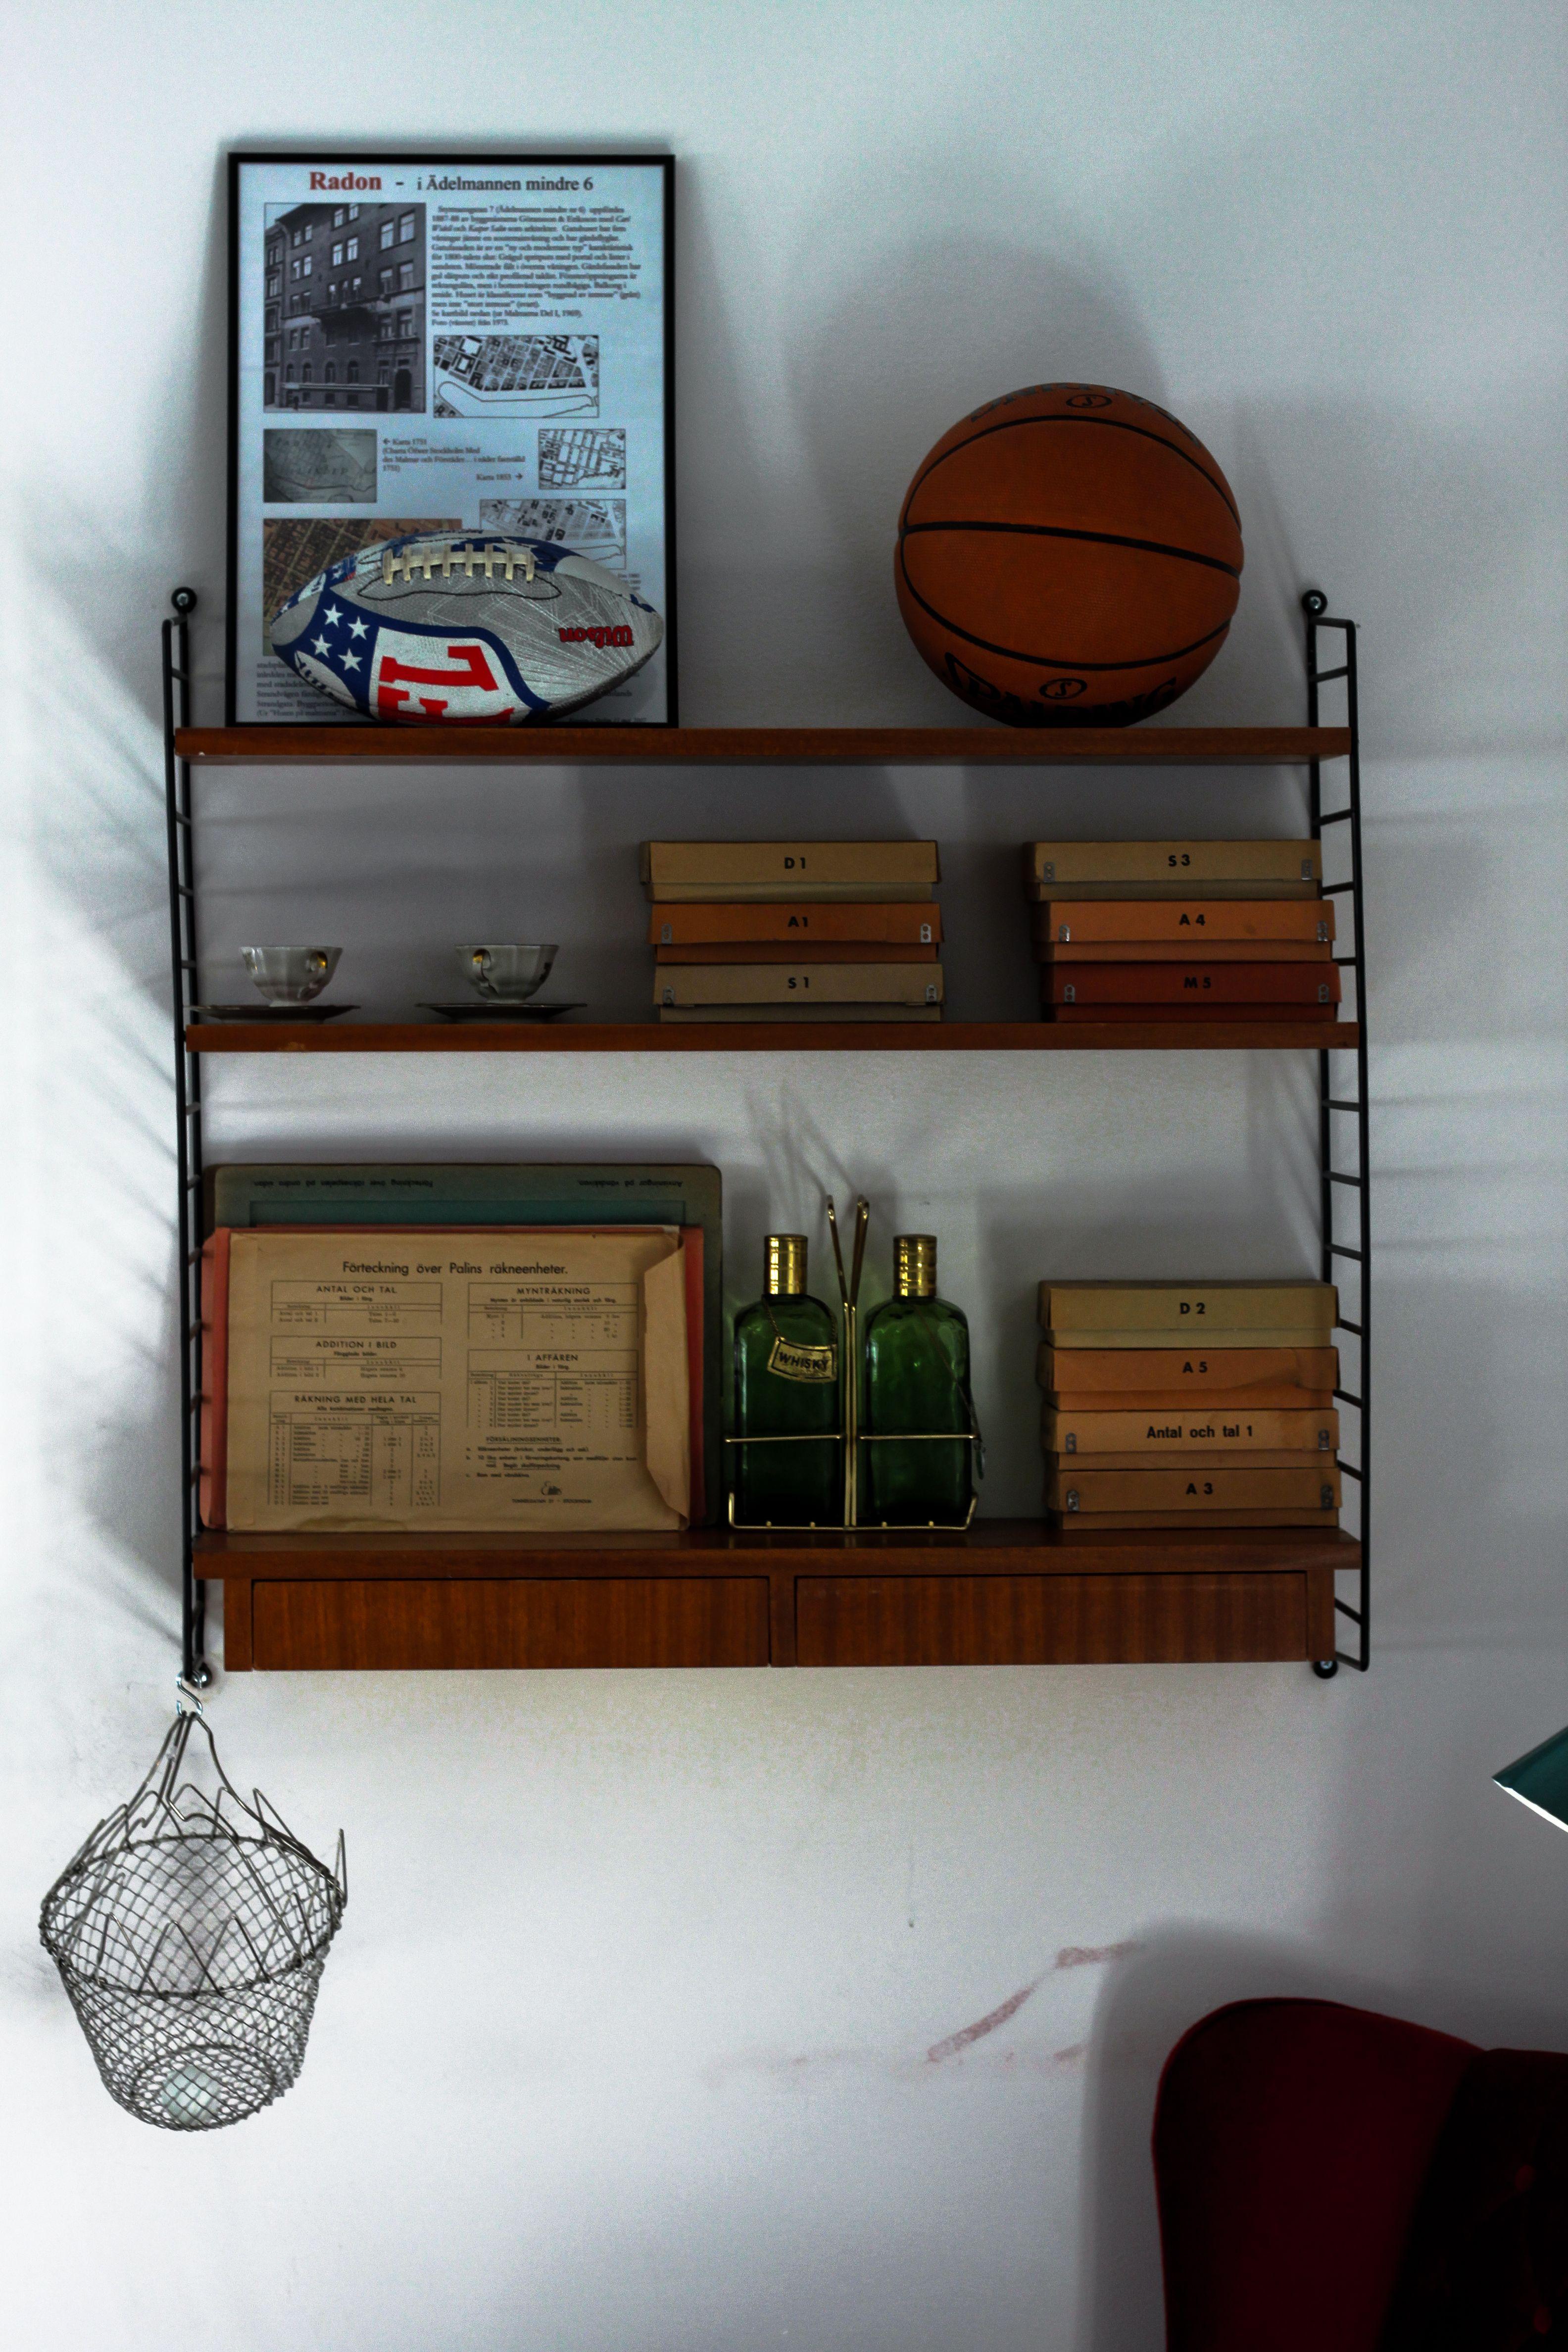 basketball + other cool stuff